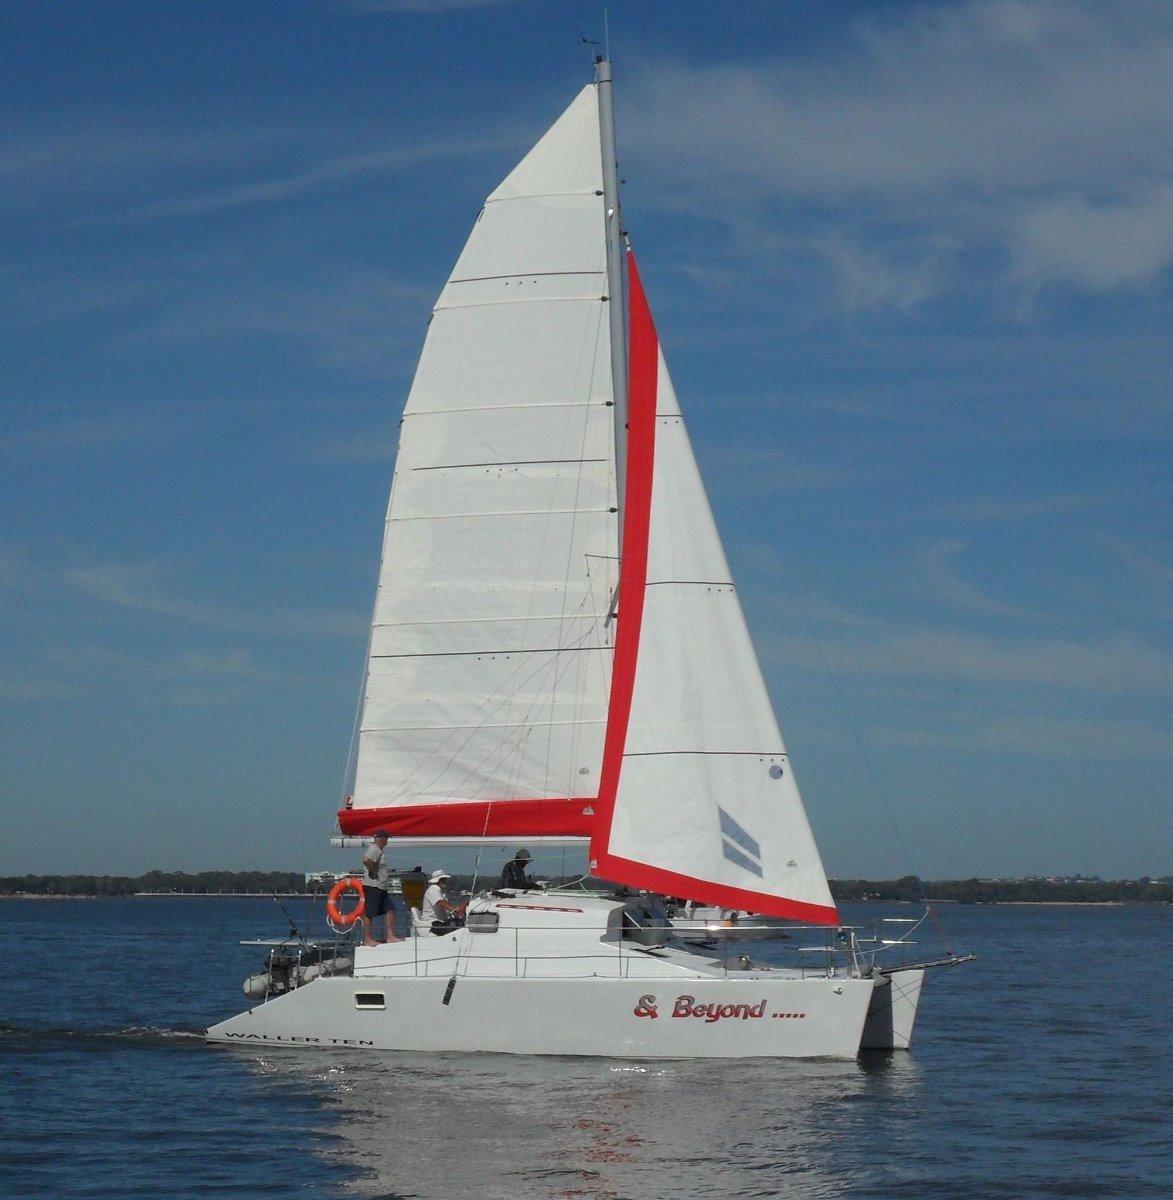 Waller Catamaran Ten Reduced for immidate sale